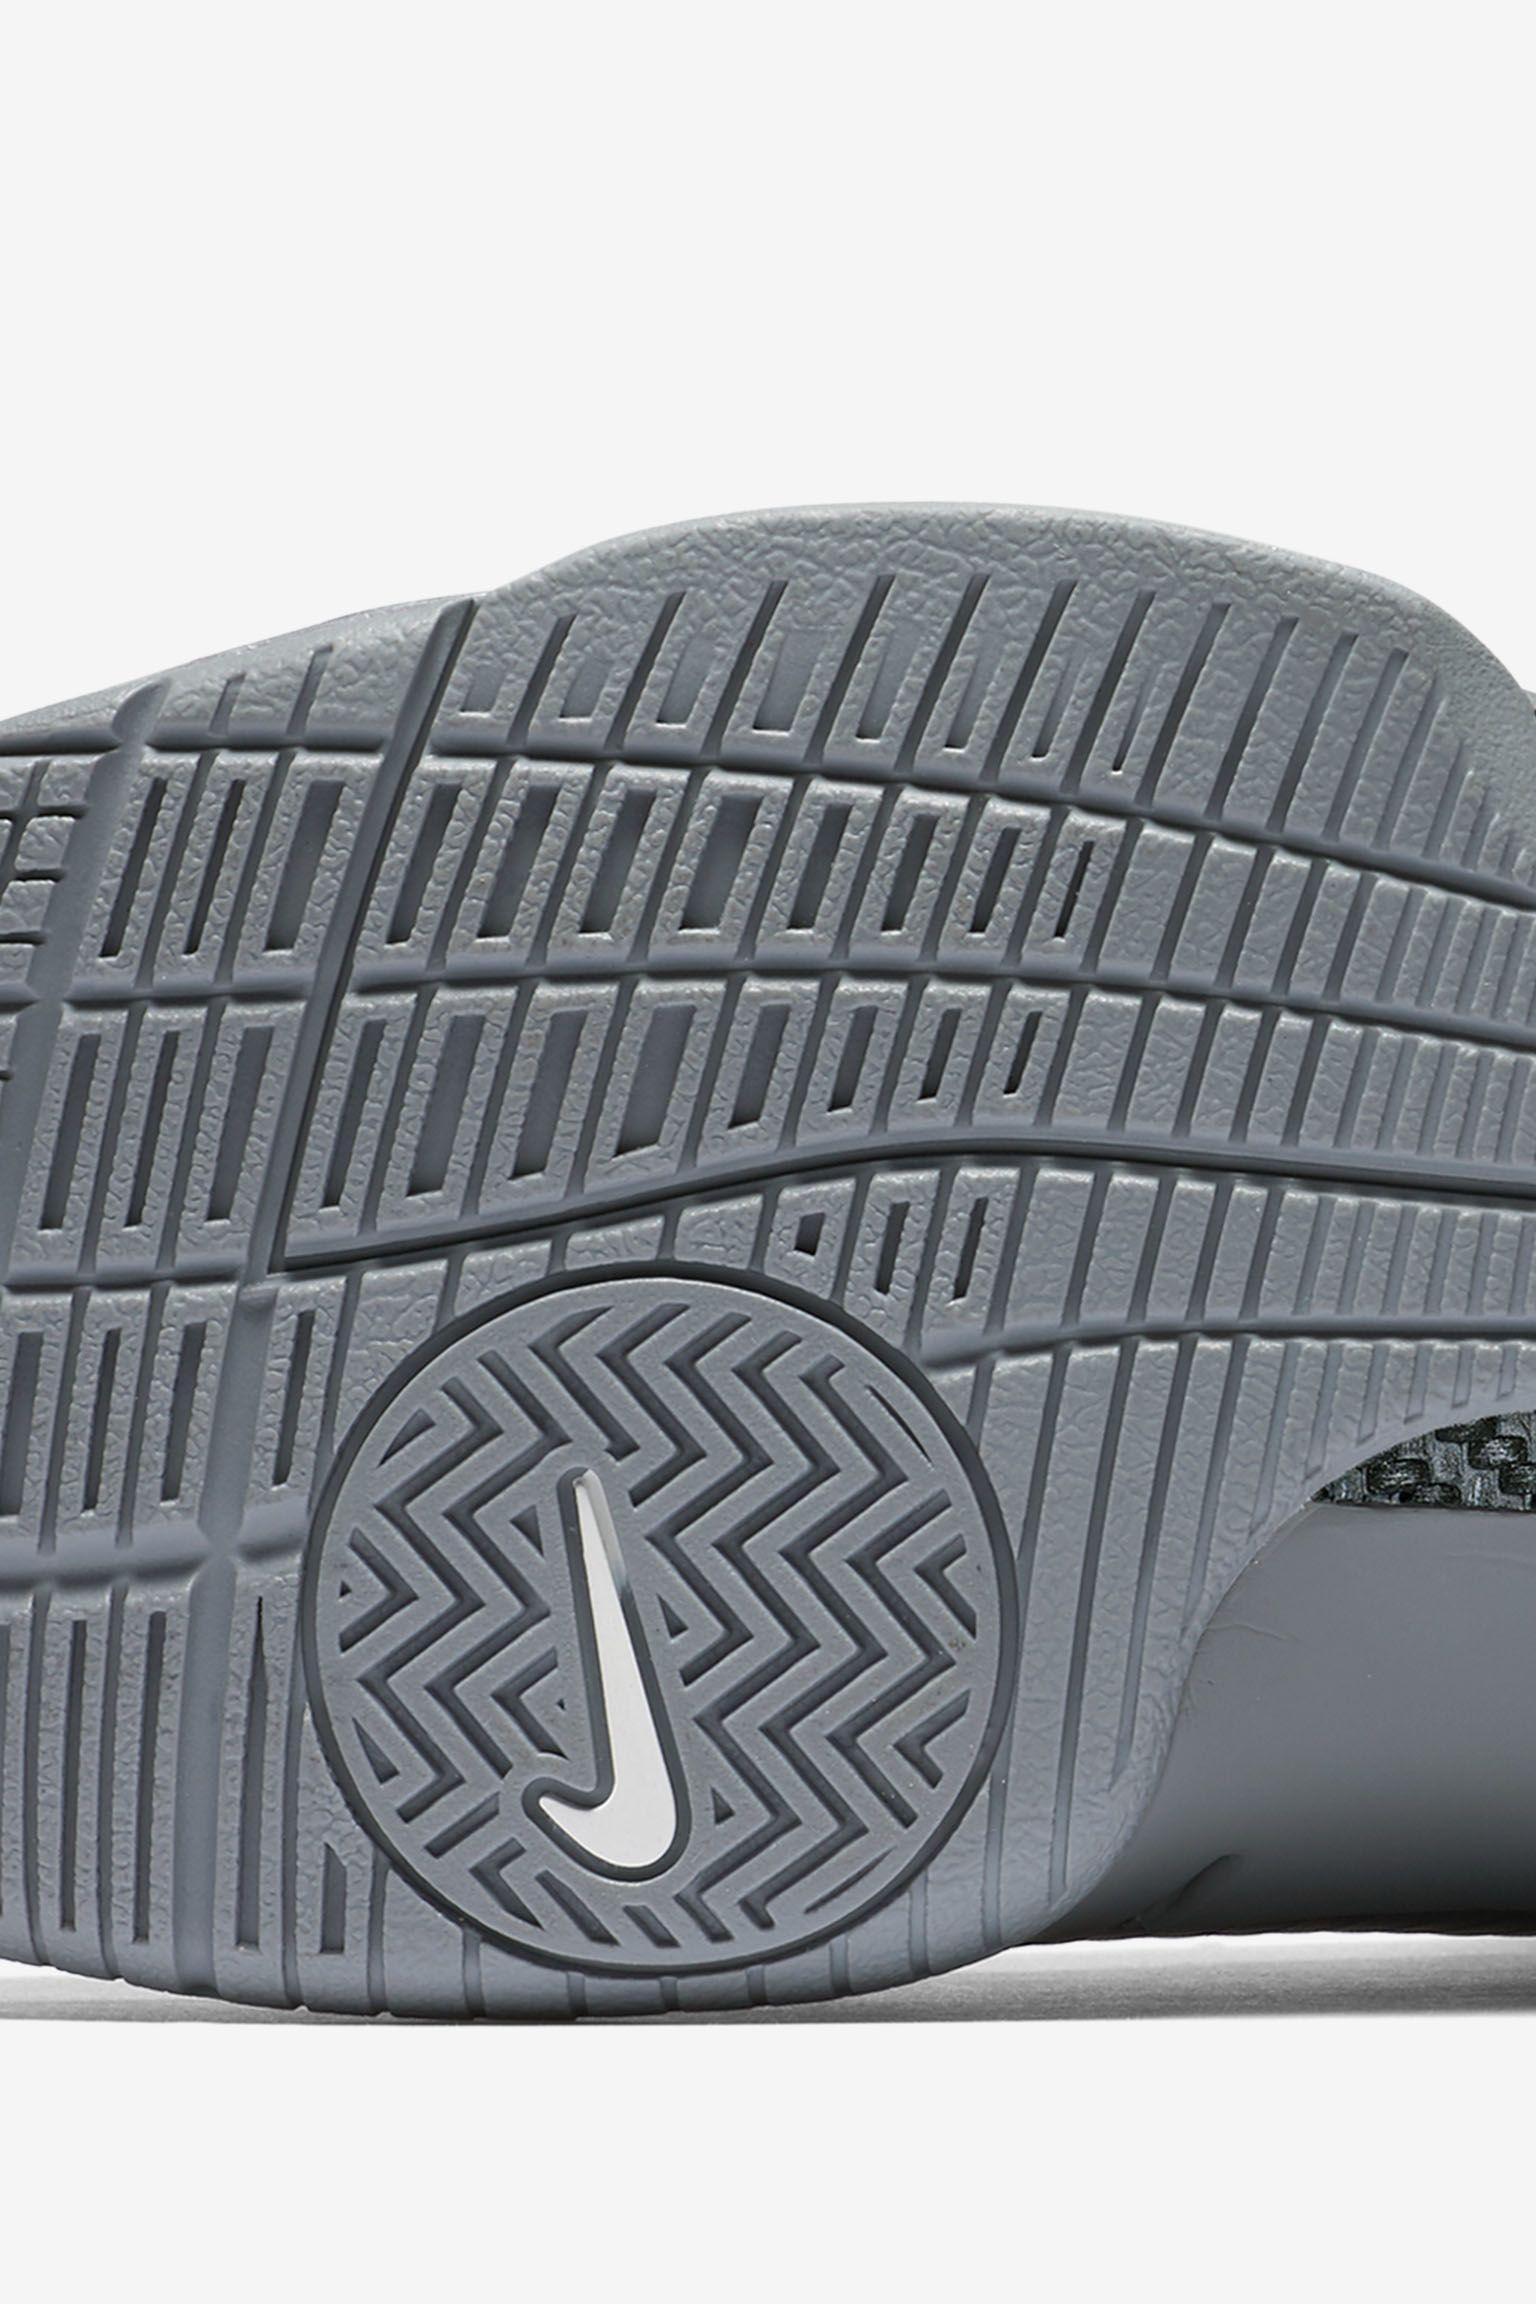 Nike Hyperdunk 08 FTB 'Black Mamba' Release Date